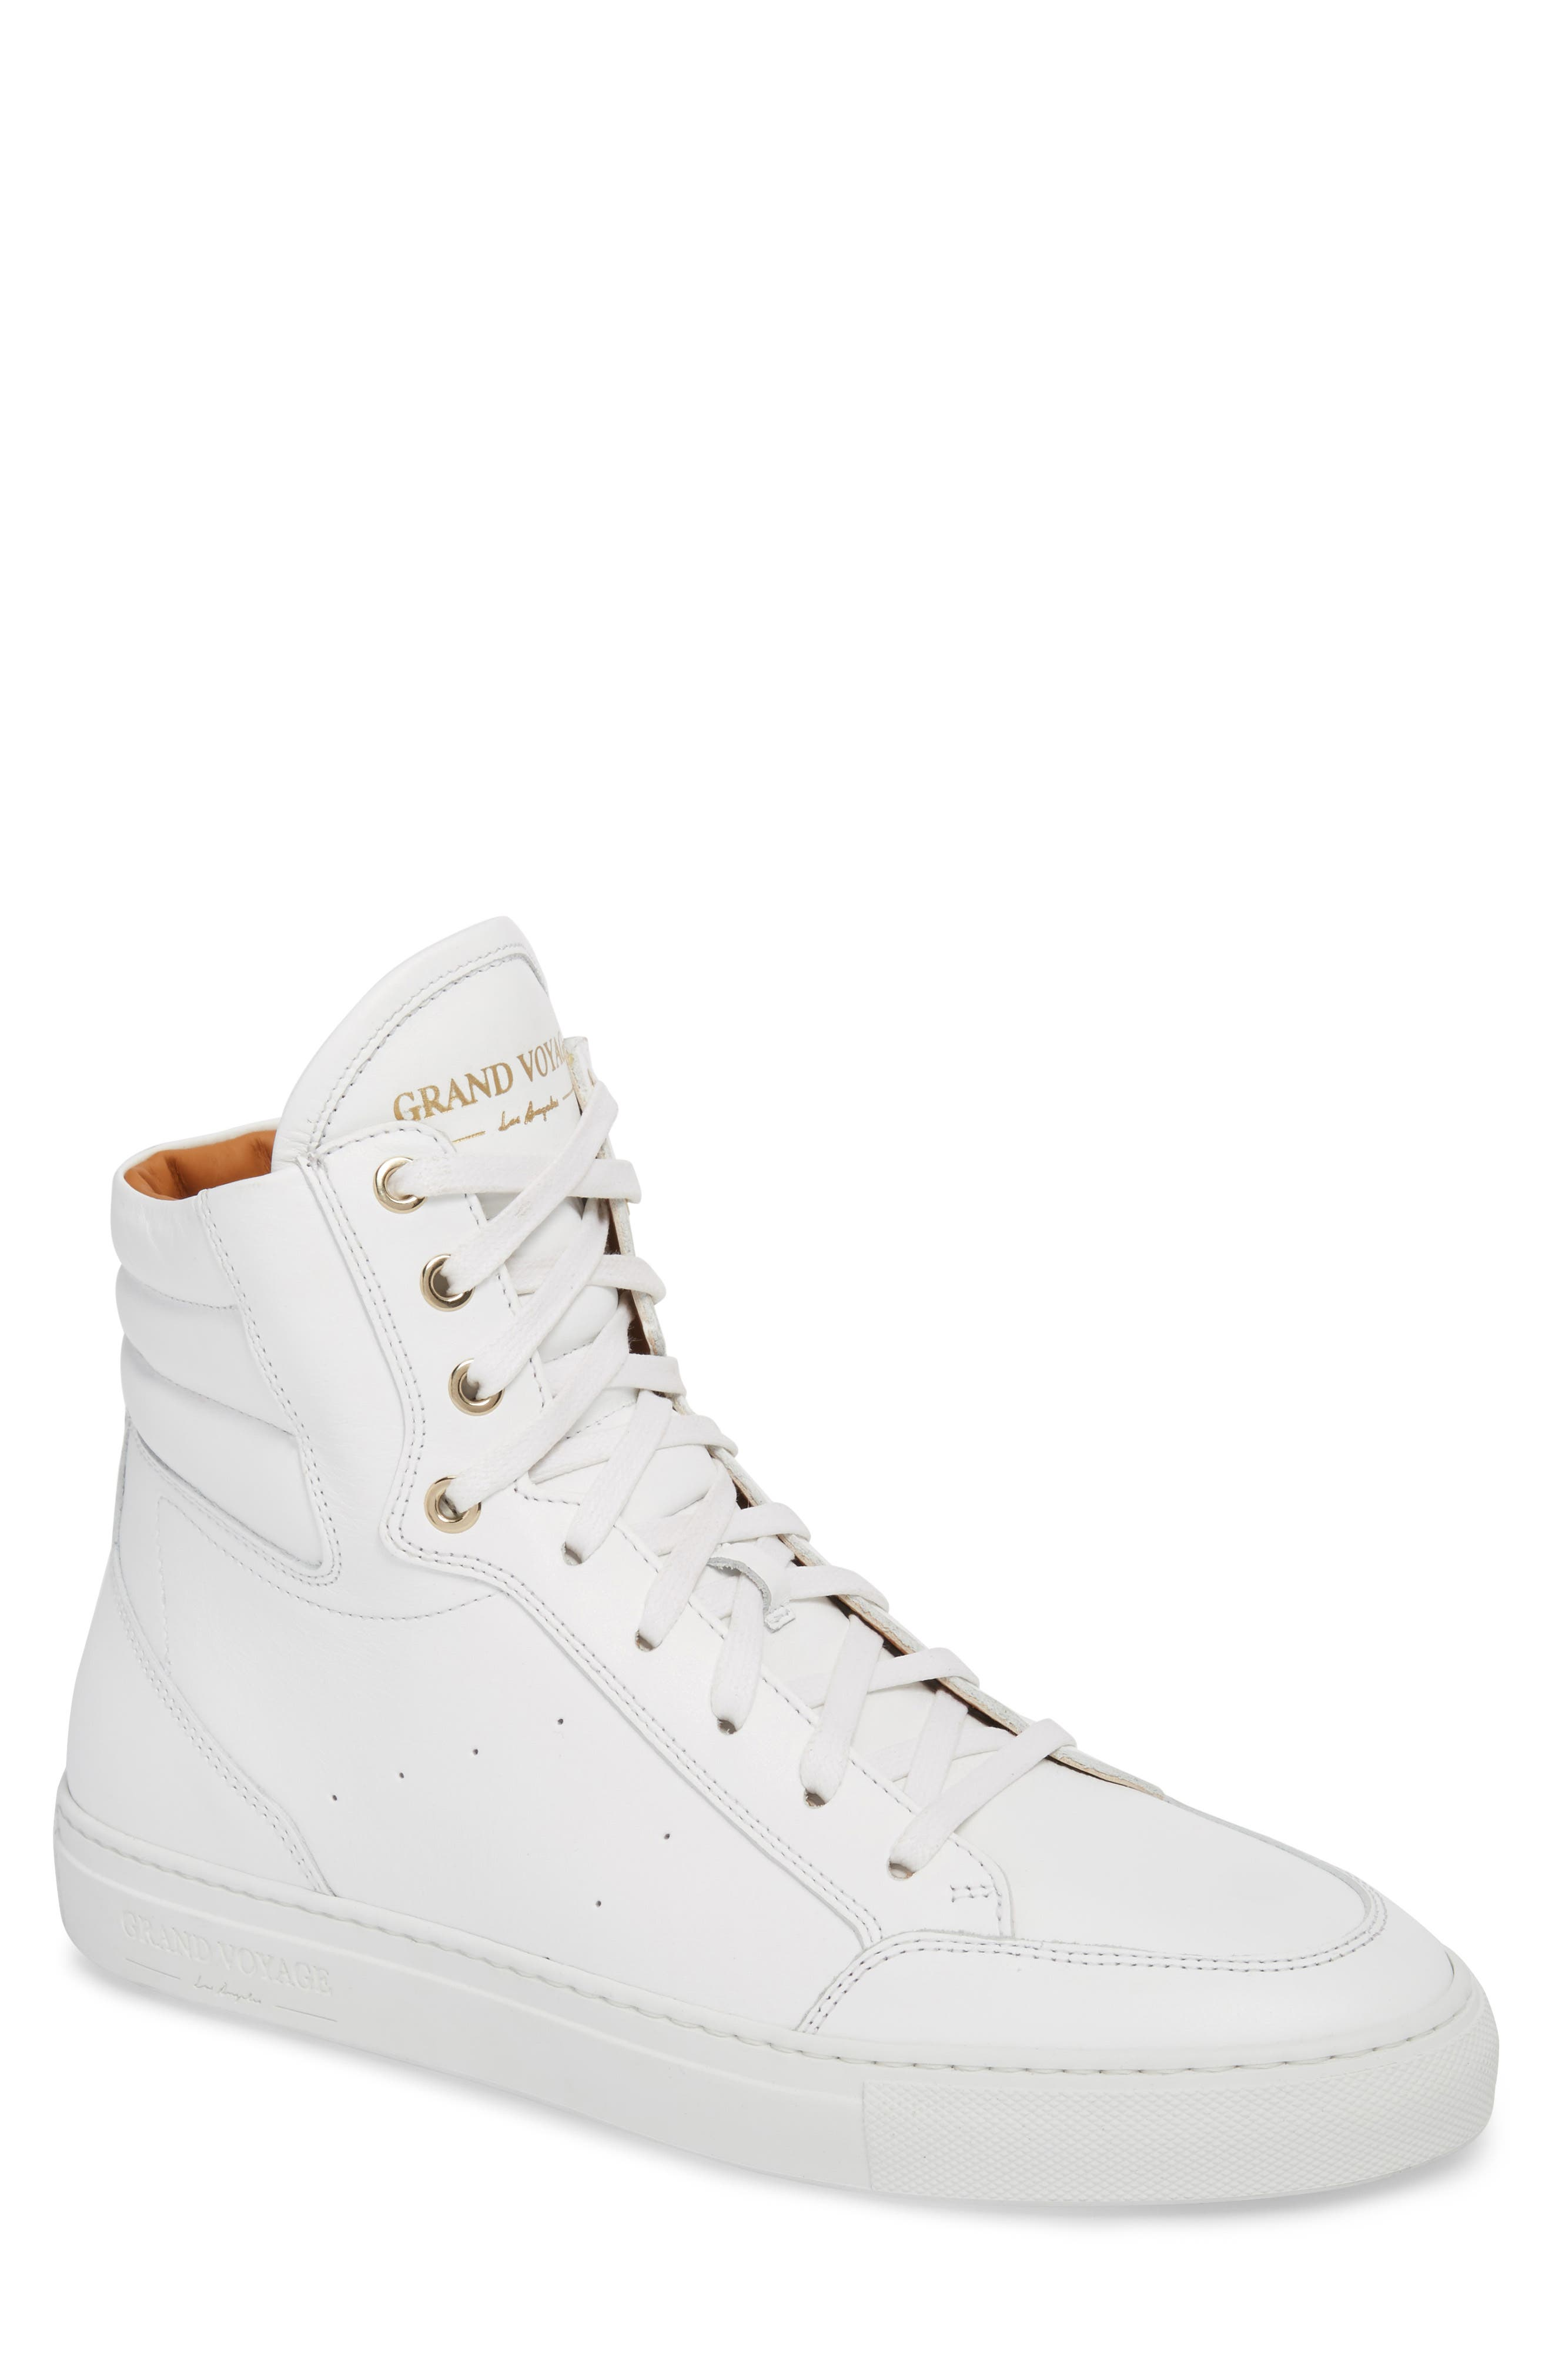 Grand Voyage Belmondo Sneaker (Men)